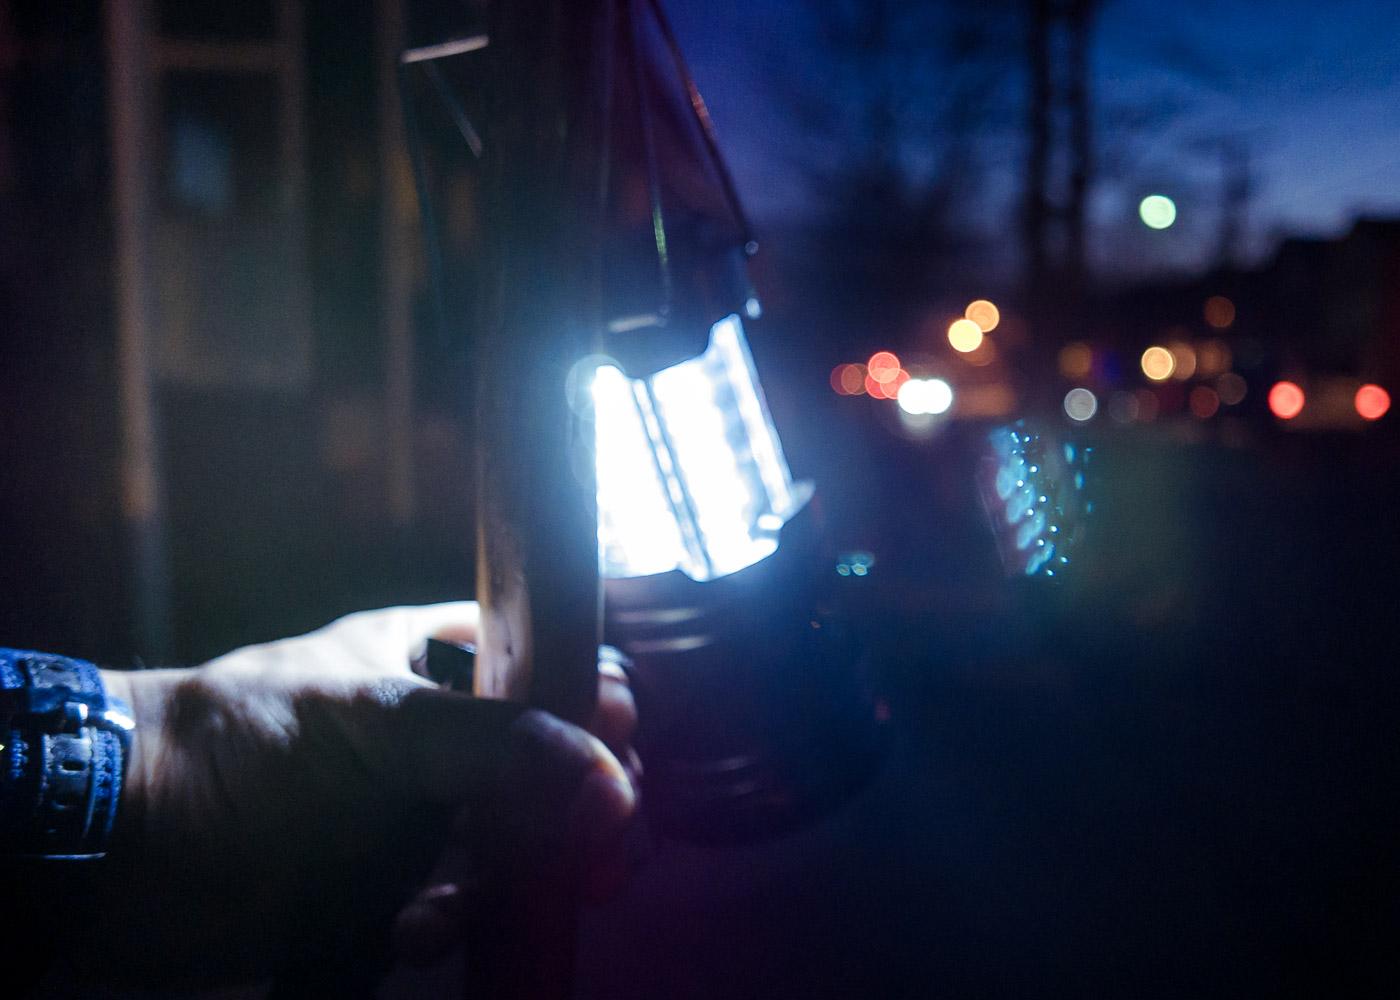 Night Light \ \ Day 6 \ \ 2/17/18